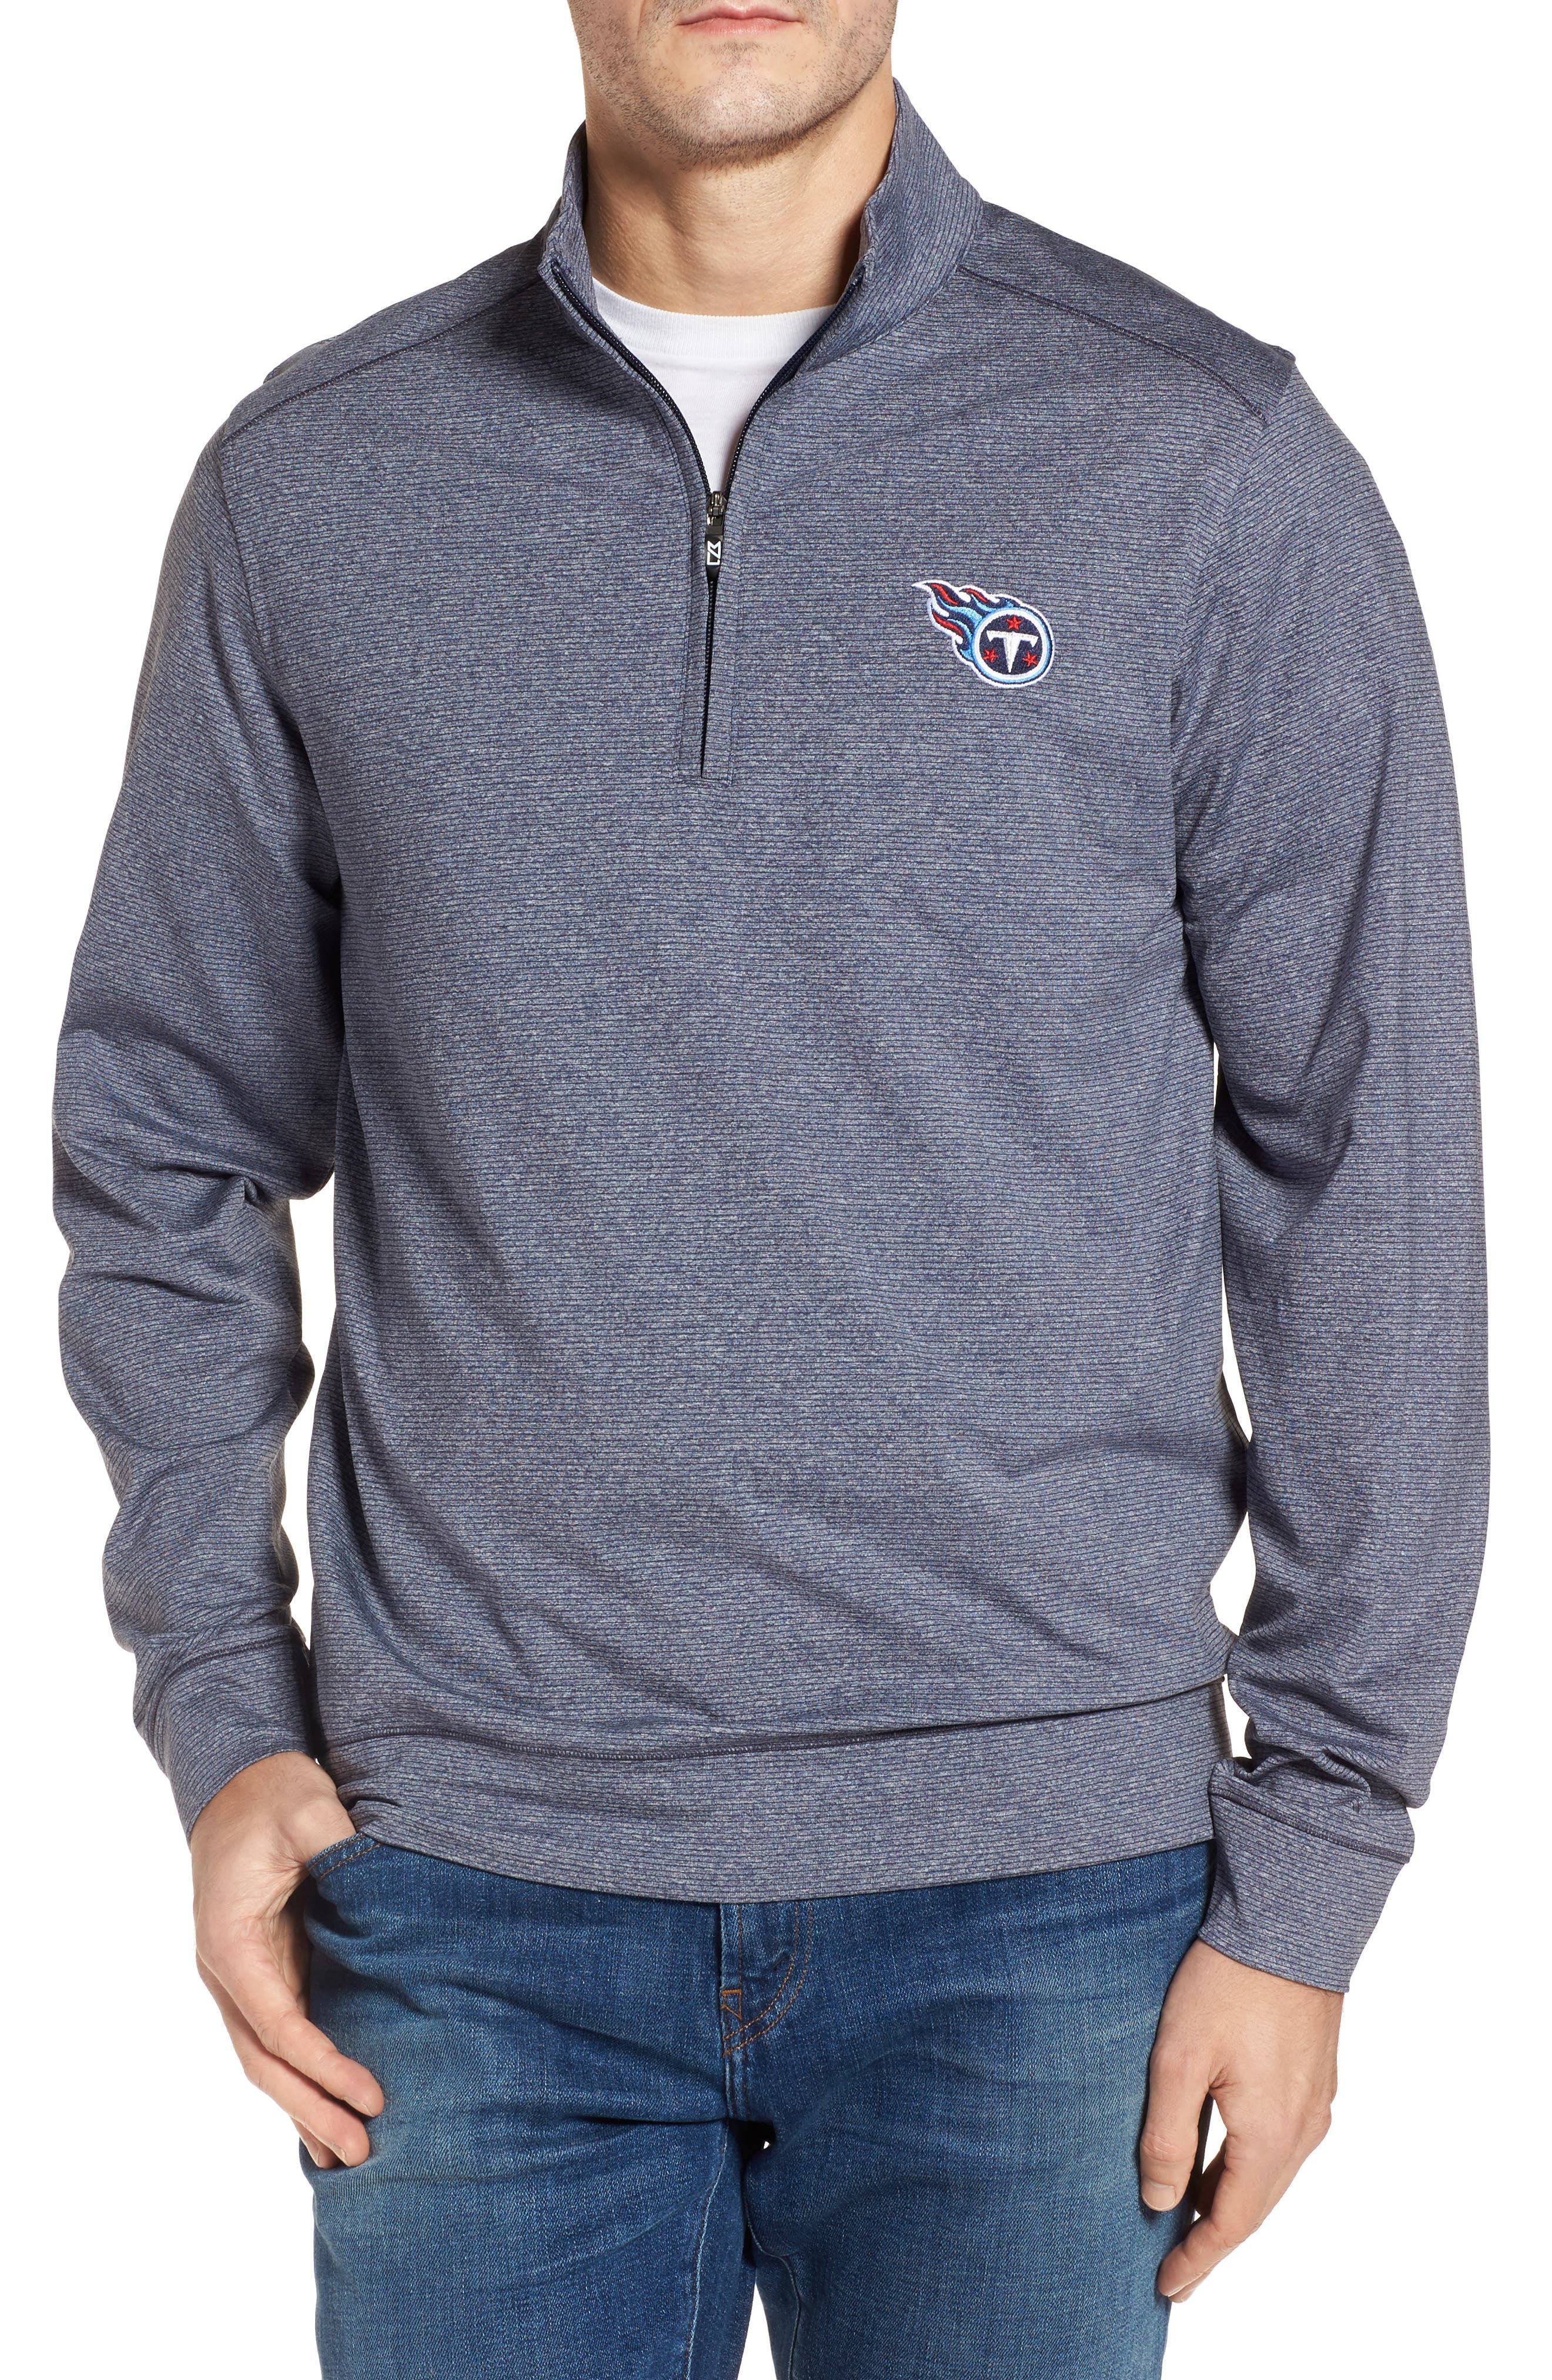 Main Image - Cutter & Buck Shoreline - Tennessee Titans Half Zip Pullover